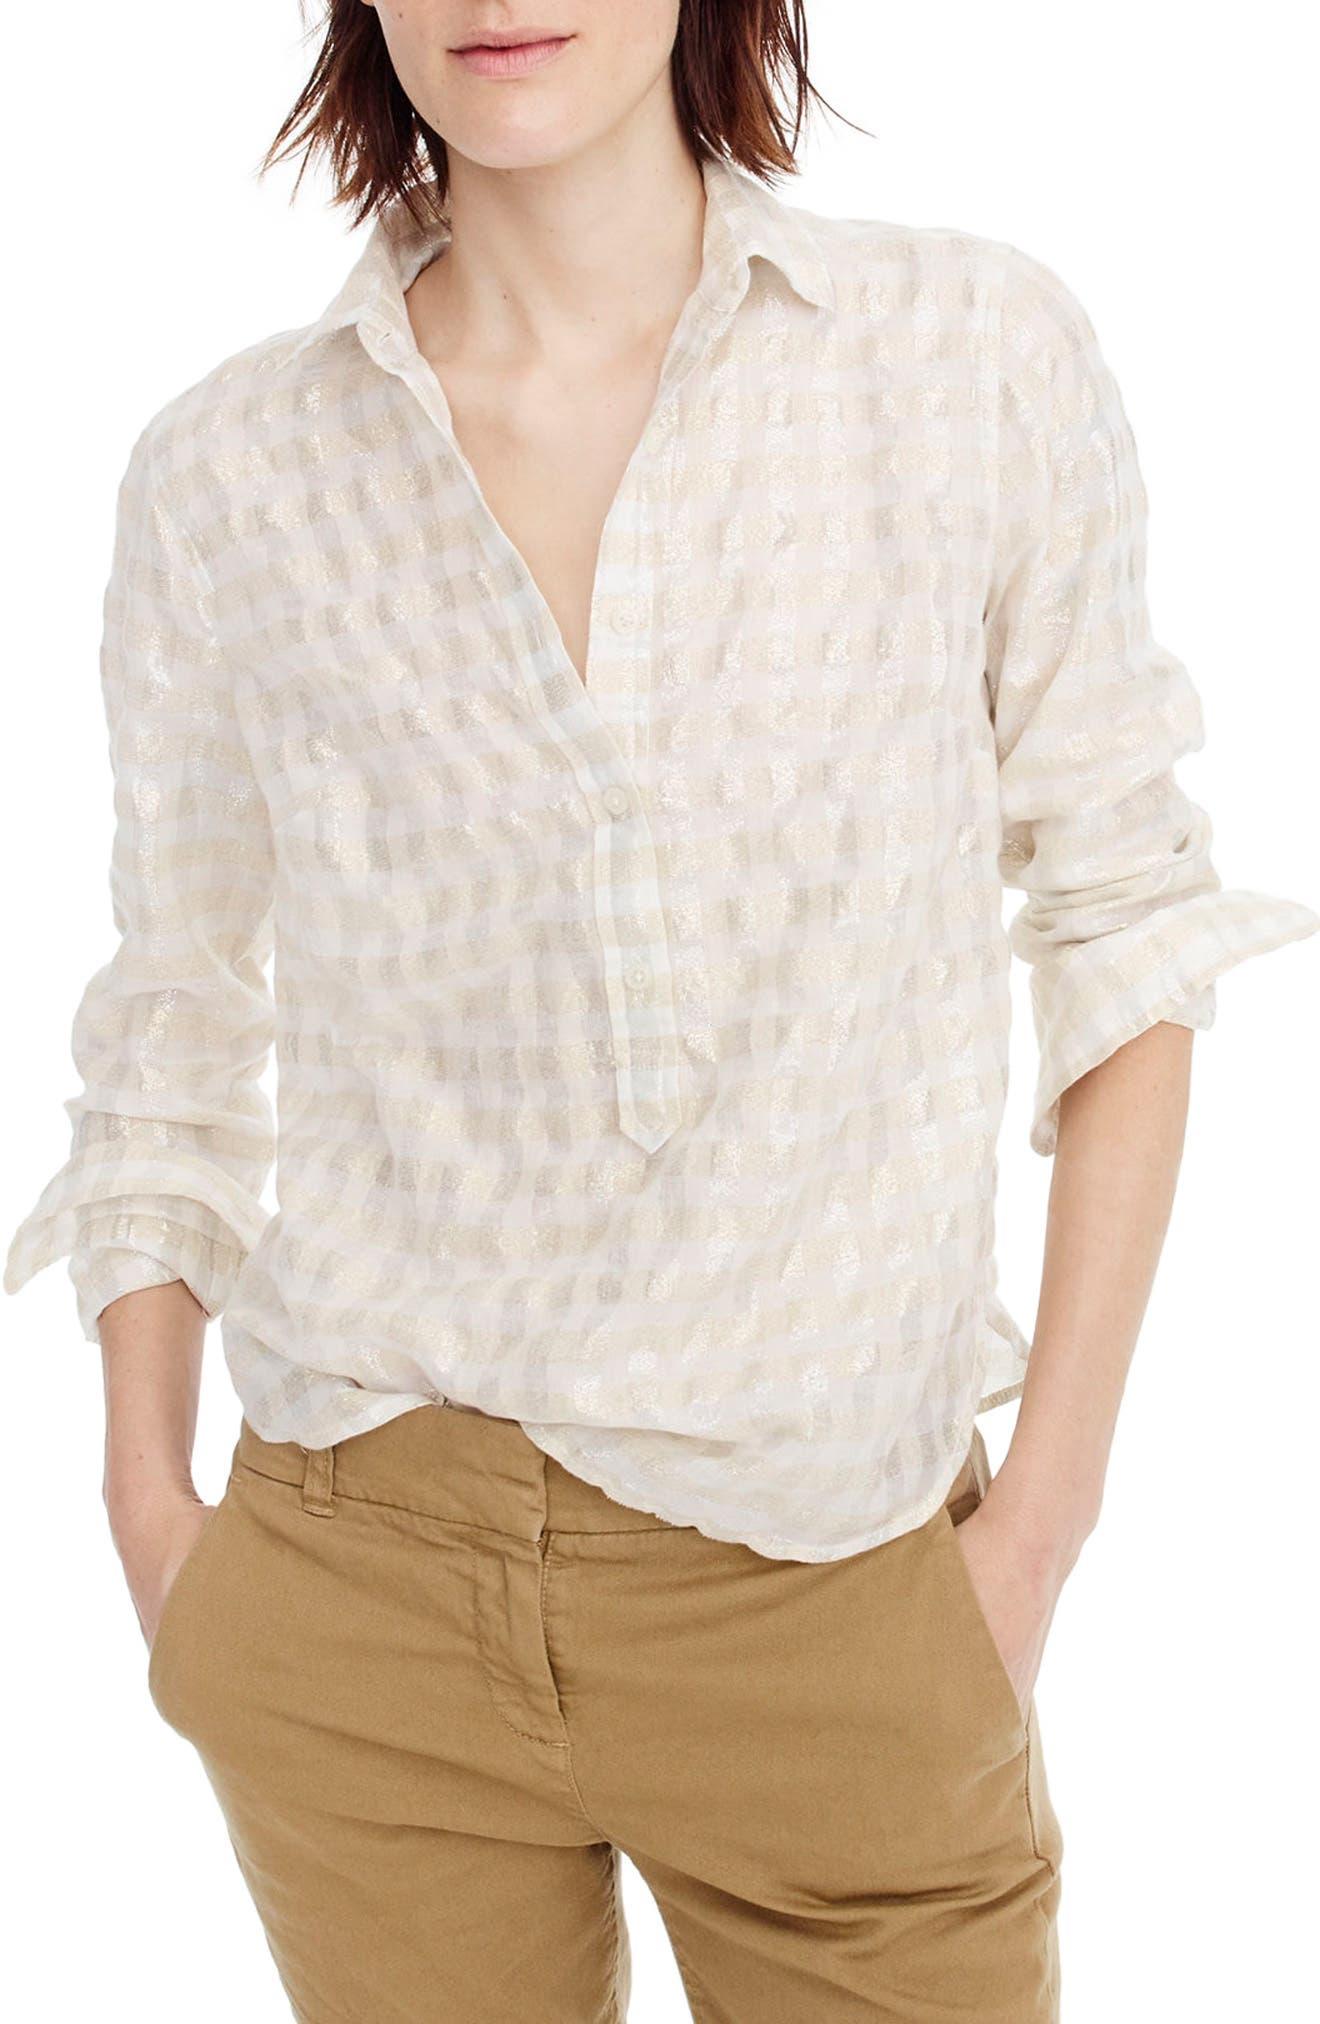 Main Image - J.Crew Metallic Cotton Voile Popover Shirt (Regular & Petite)